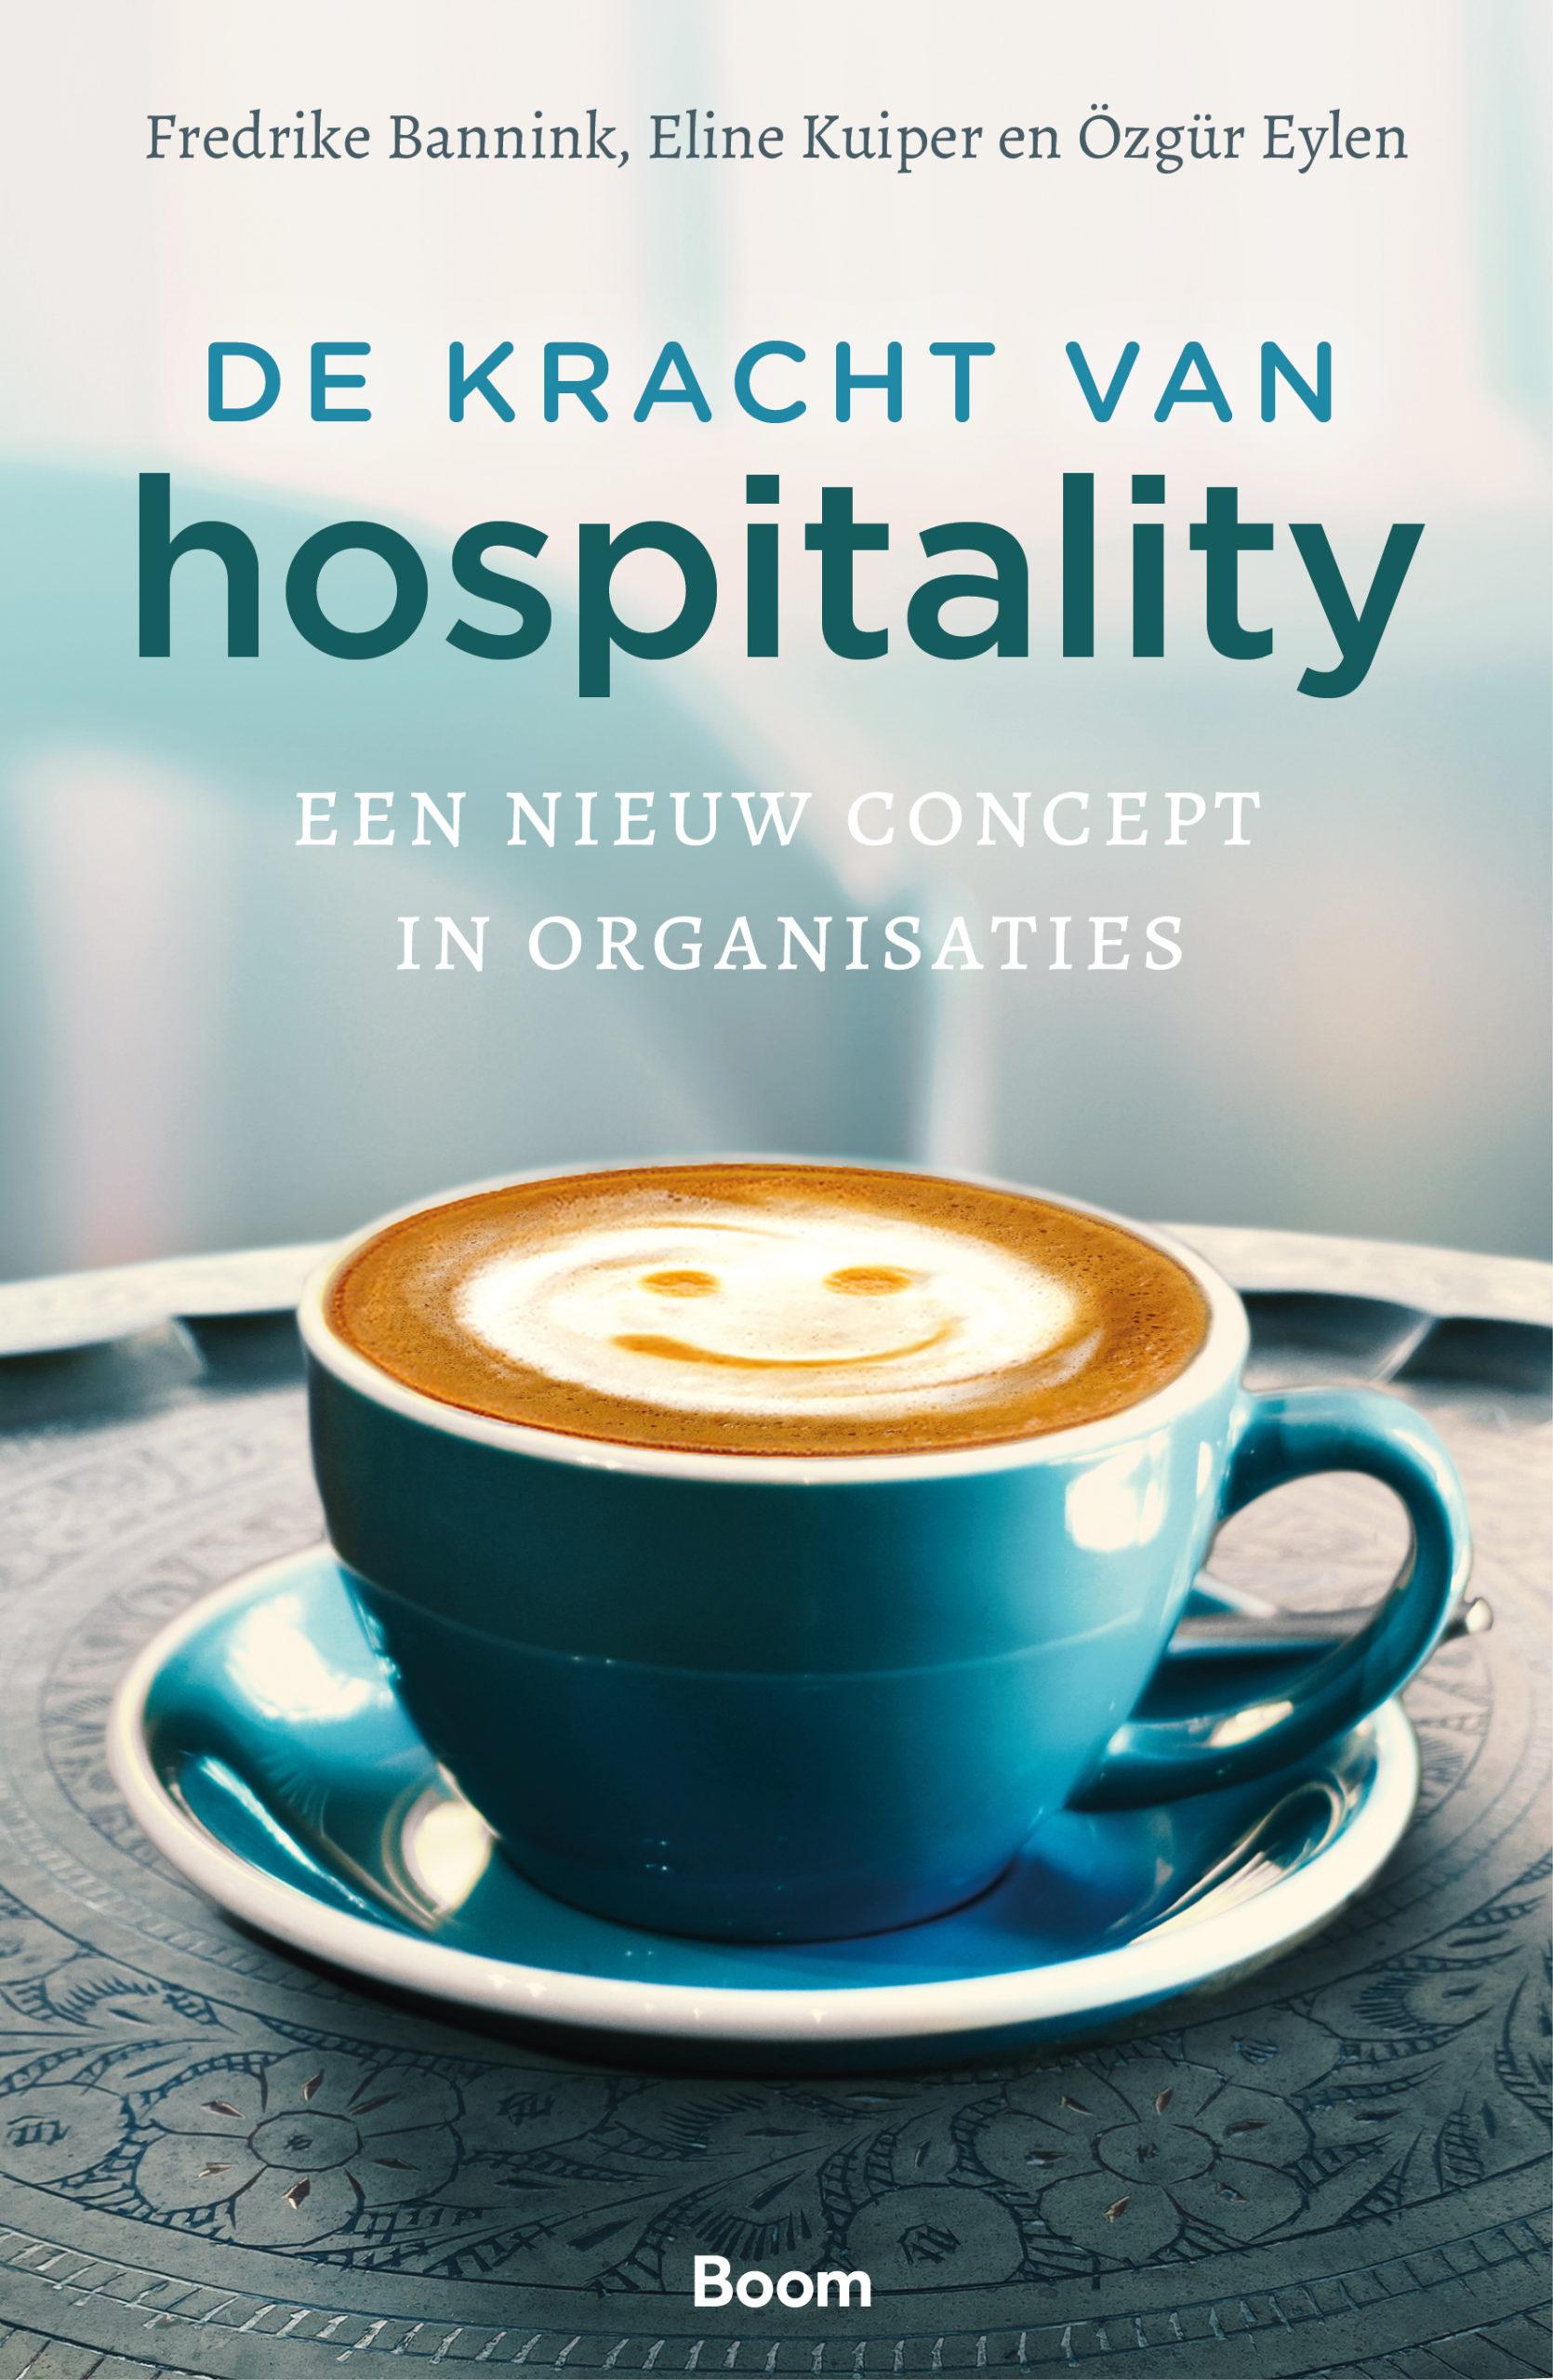 Cover image De kracht van hospitality